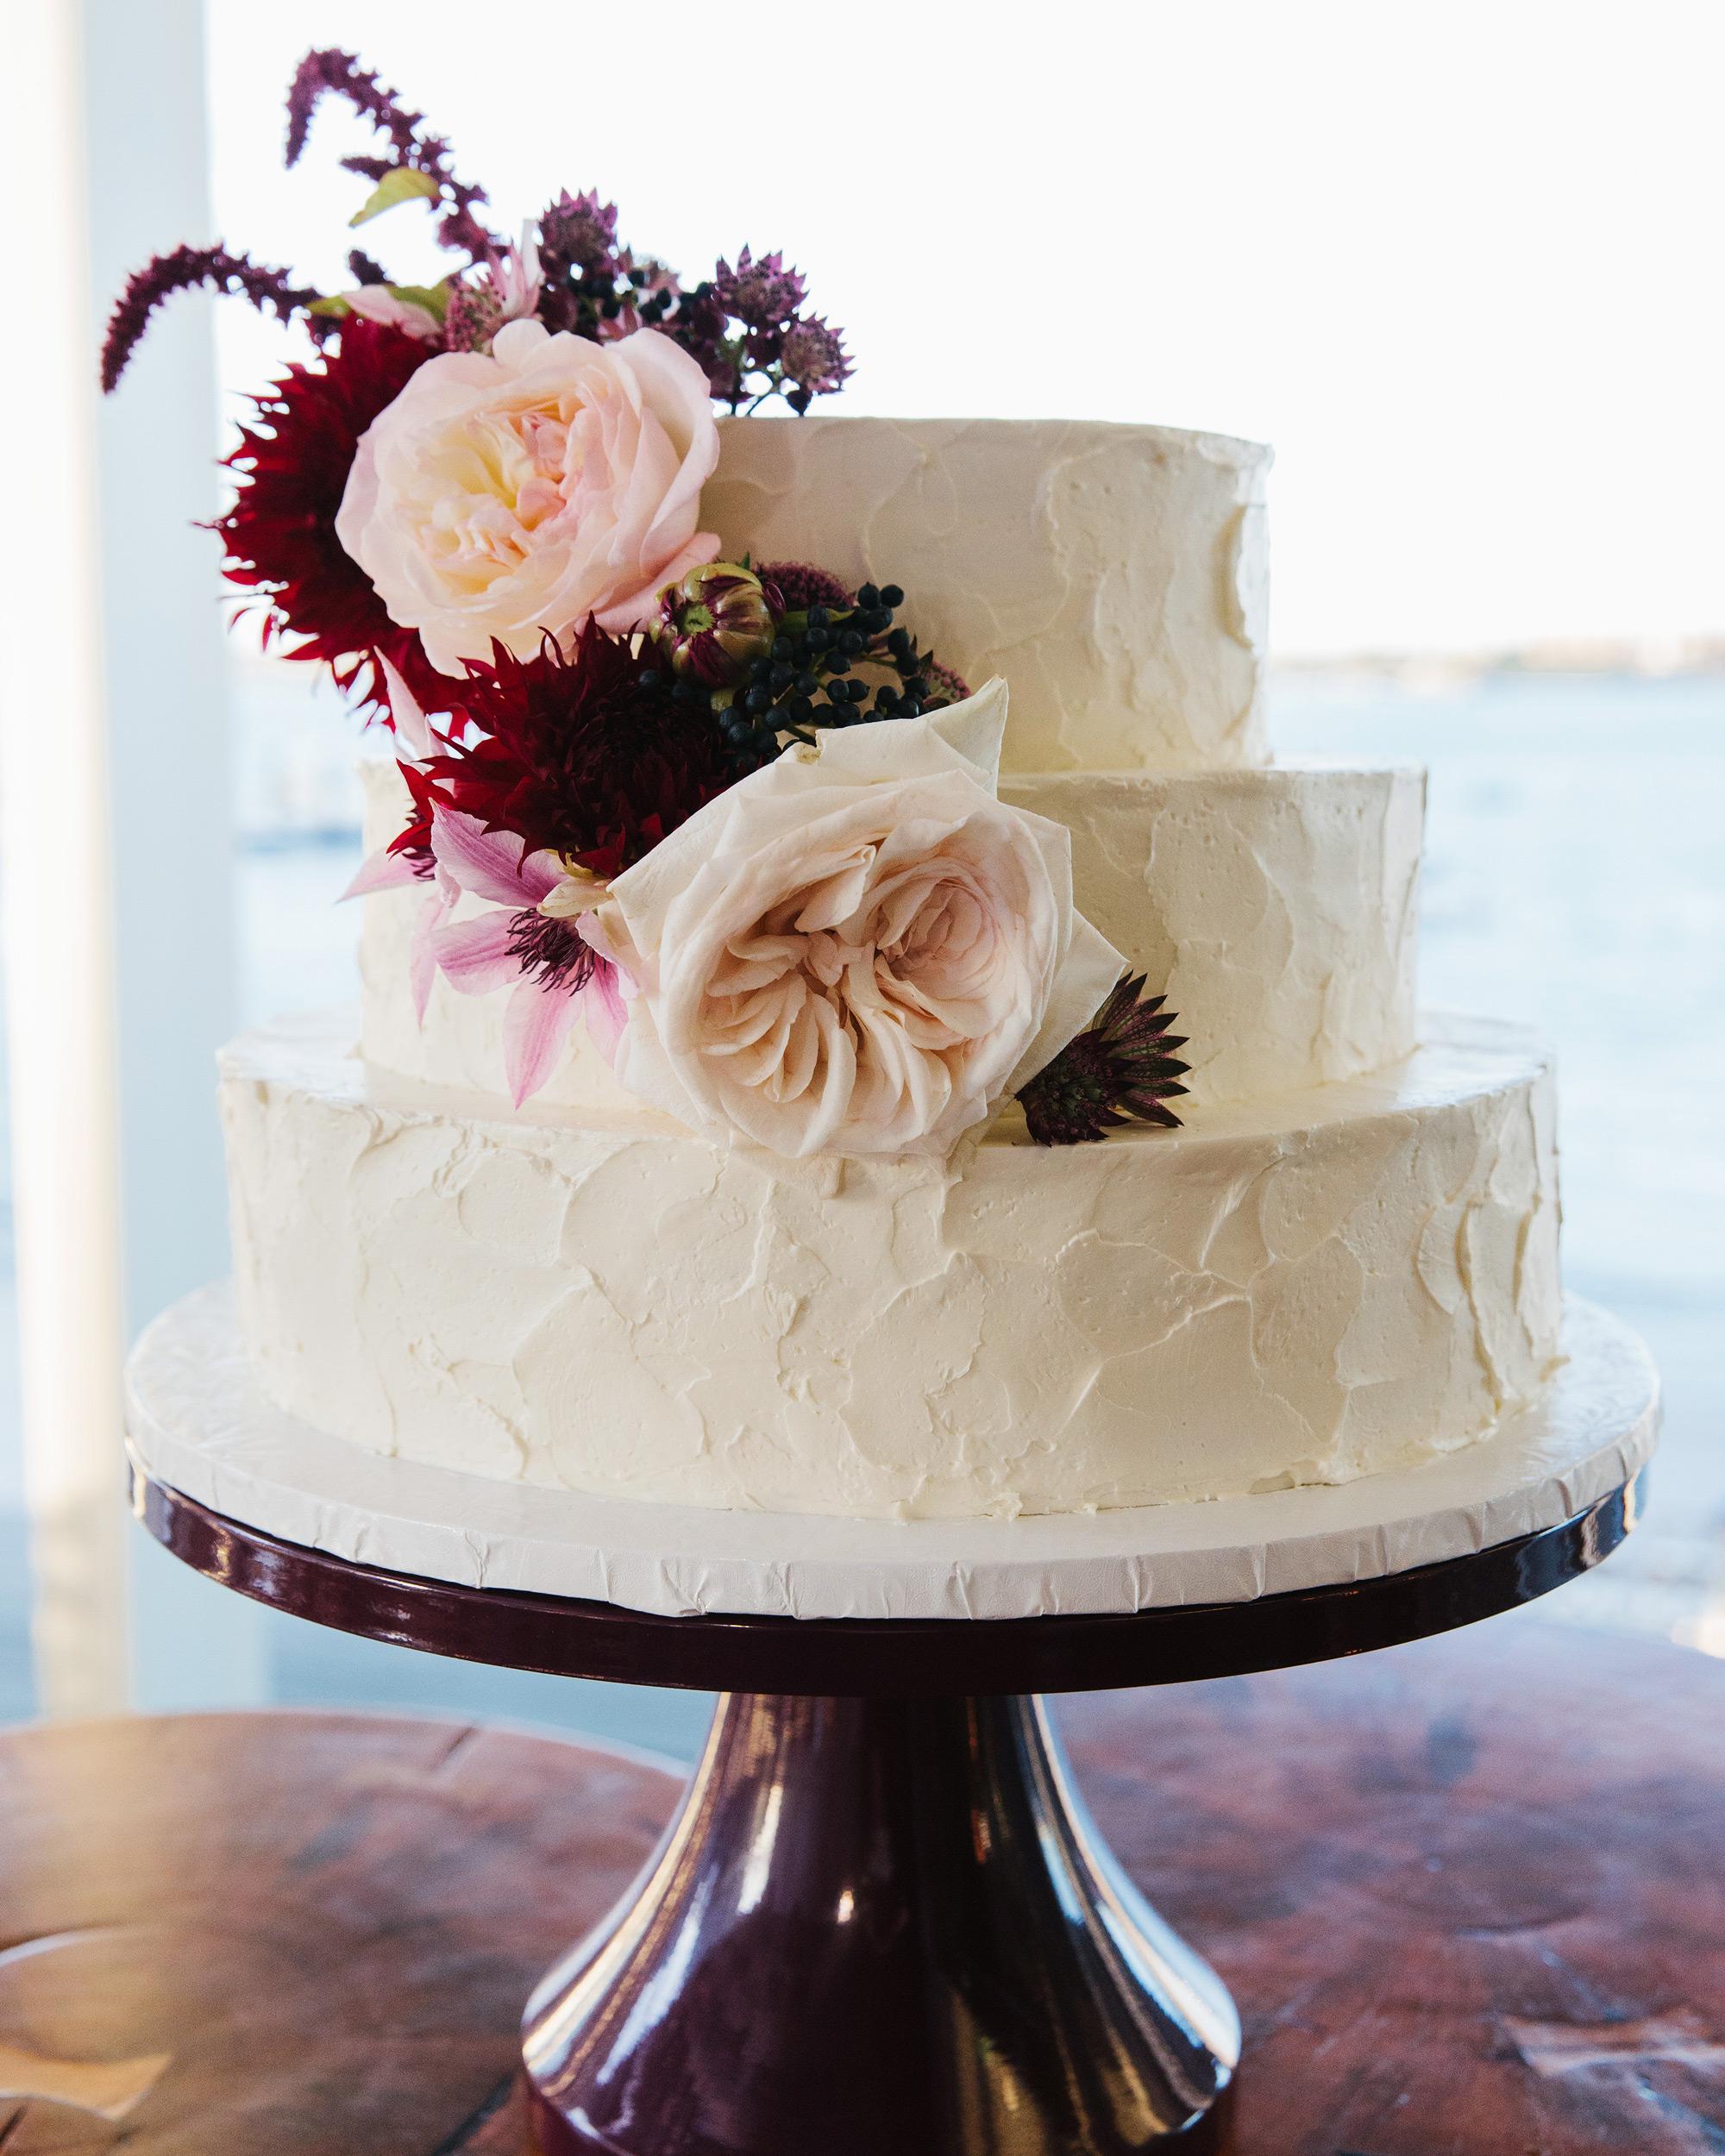 danielle-brian-wedding-cake-0780-s113001-0616.jpg